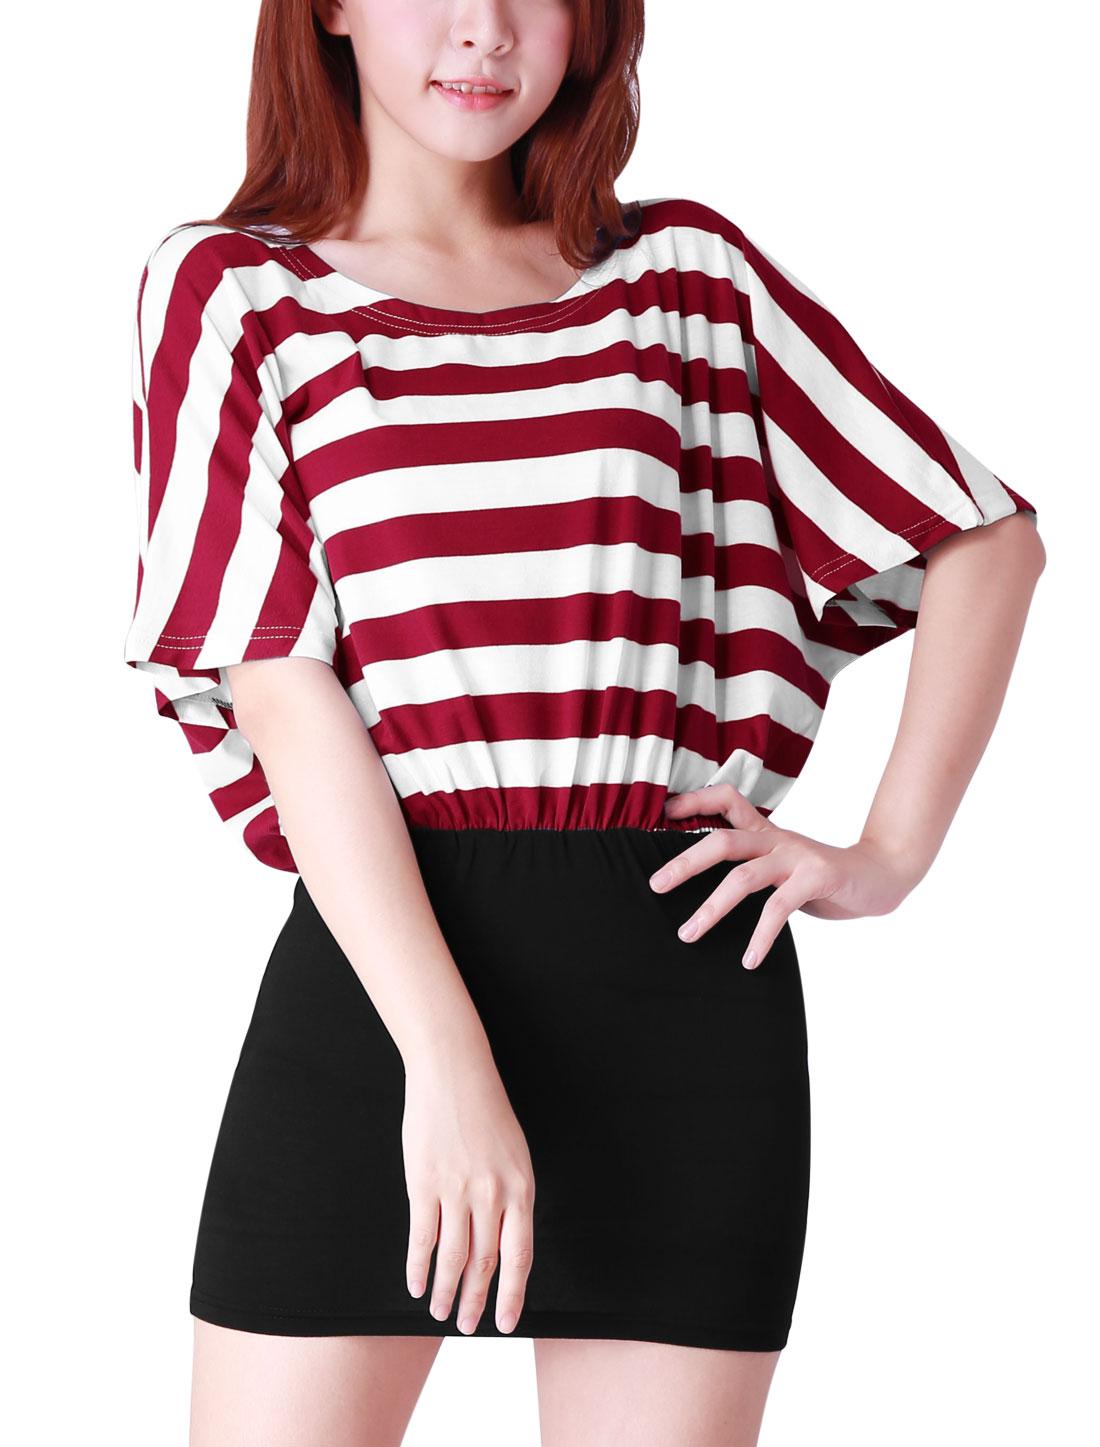 Woman Chic Scoop Neck Short Dolman Sleeve Warm Red Black Mini Dress XS